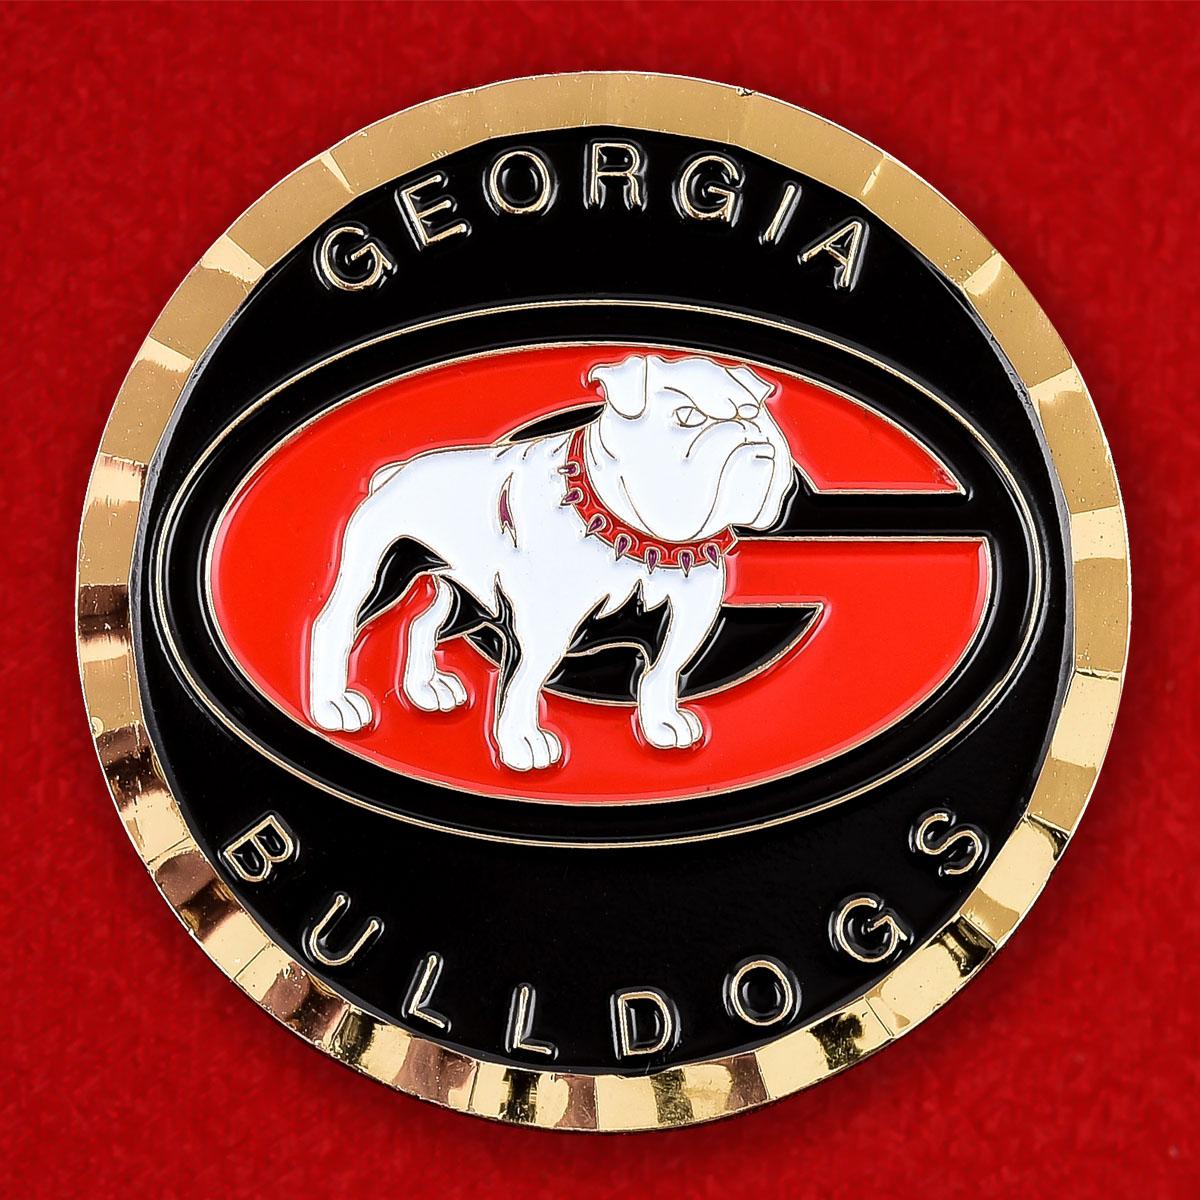 Челлендж коин клуба Georgia Bulldogs